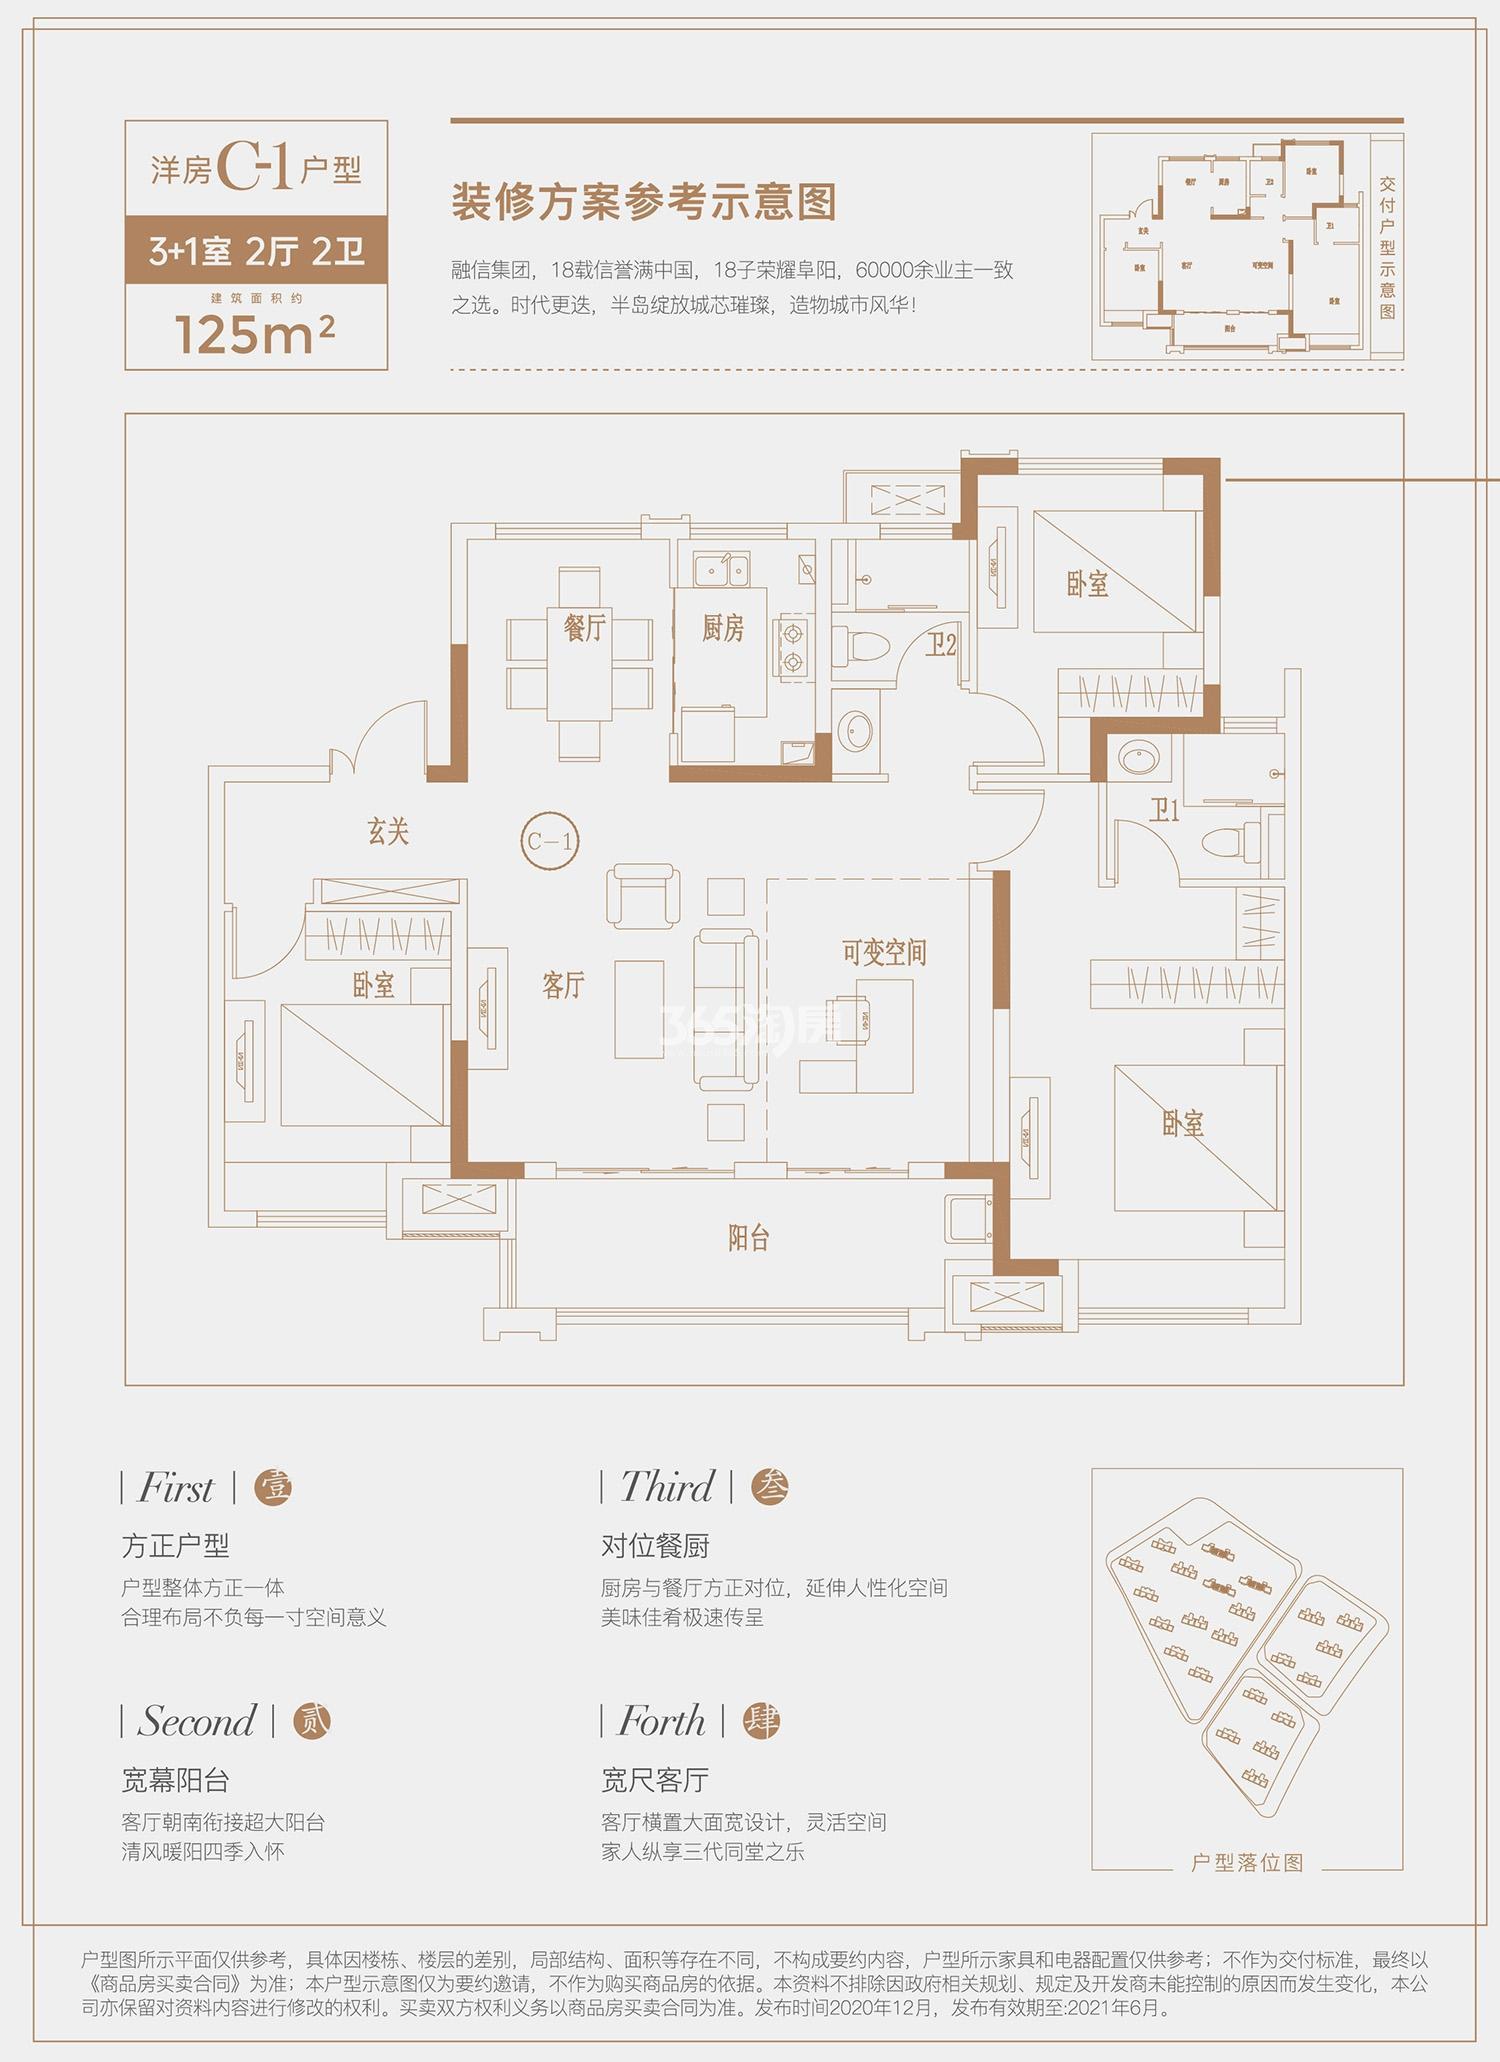 洋房C1户型,3+1室2厅2卫125㎡